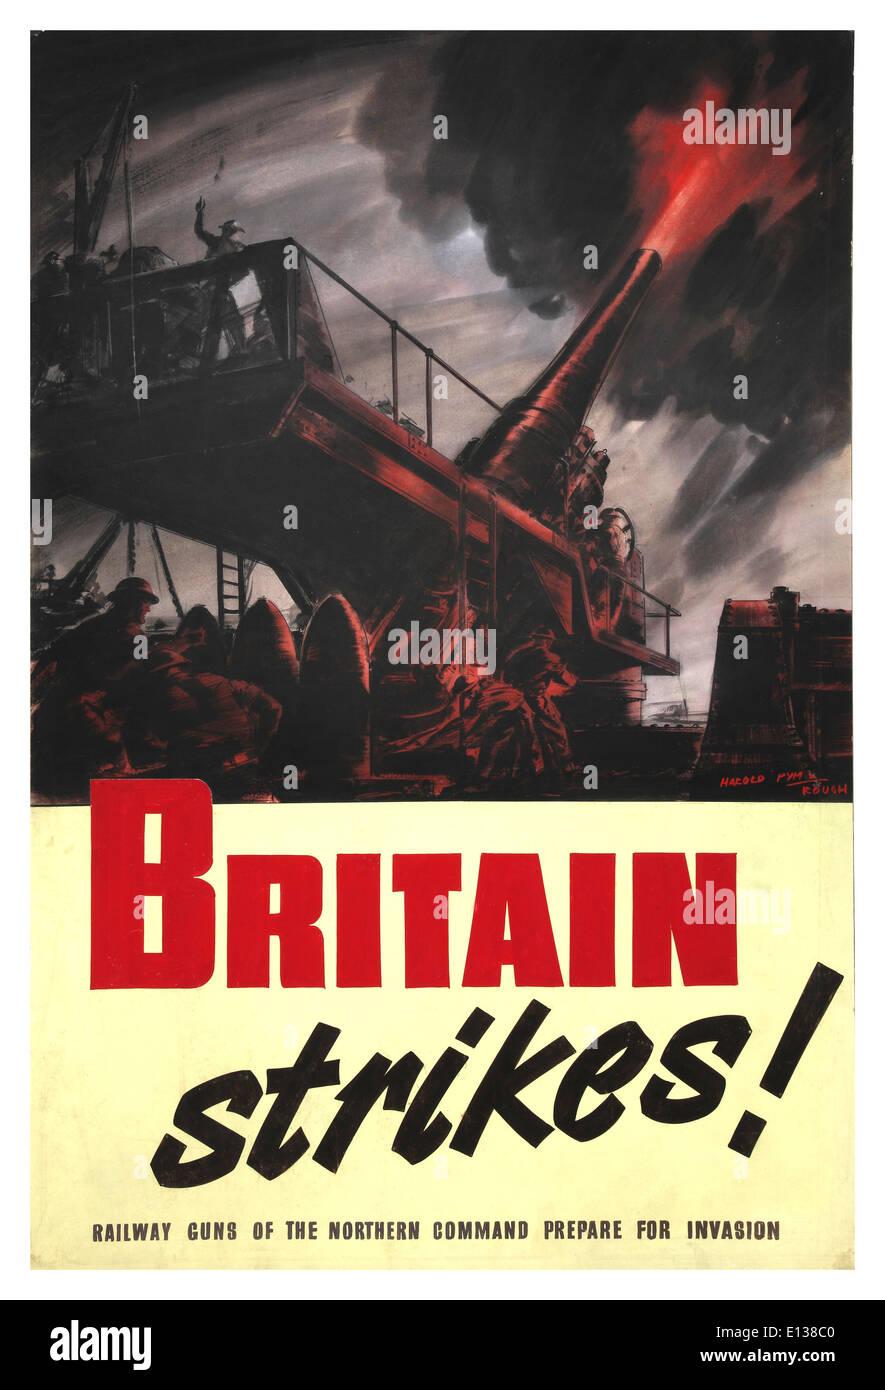 WW2 propaganda poster 'Britain Strikes' railway guns of Northern Command preparing for invasion 1944 - Stock Image